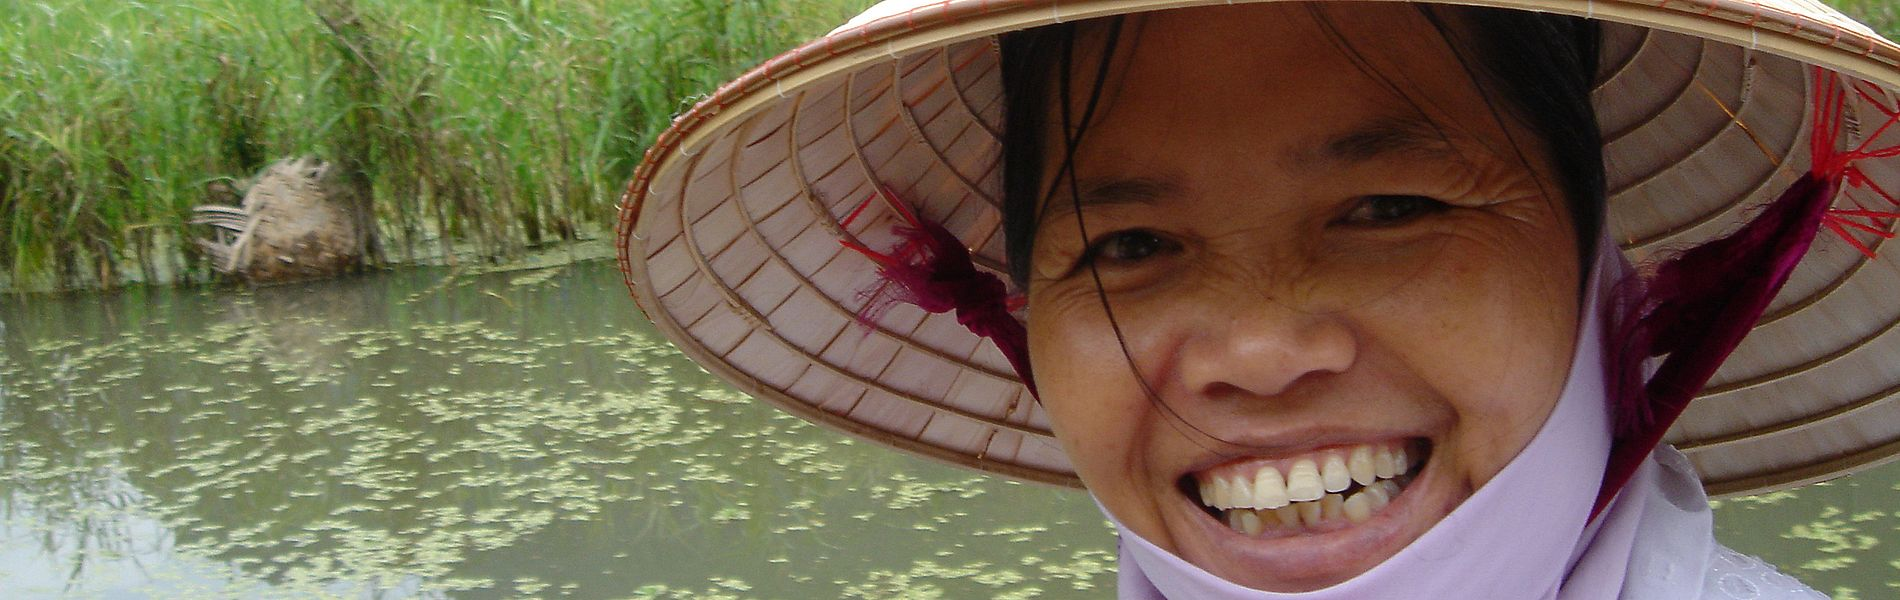 Lächelnde Frau, Vietnam, Ninh Binh